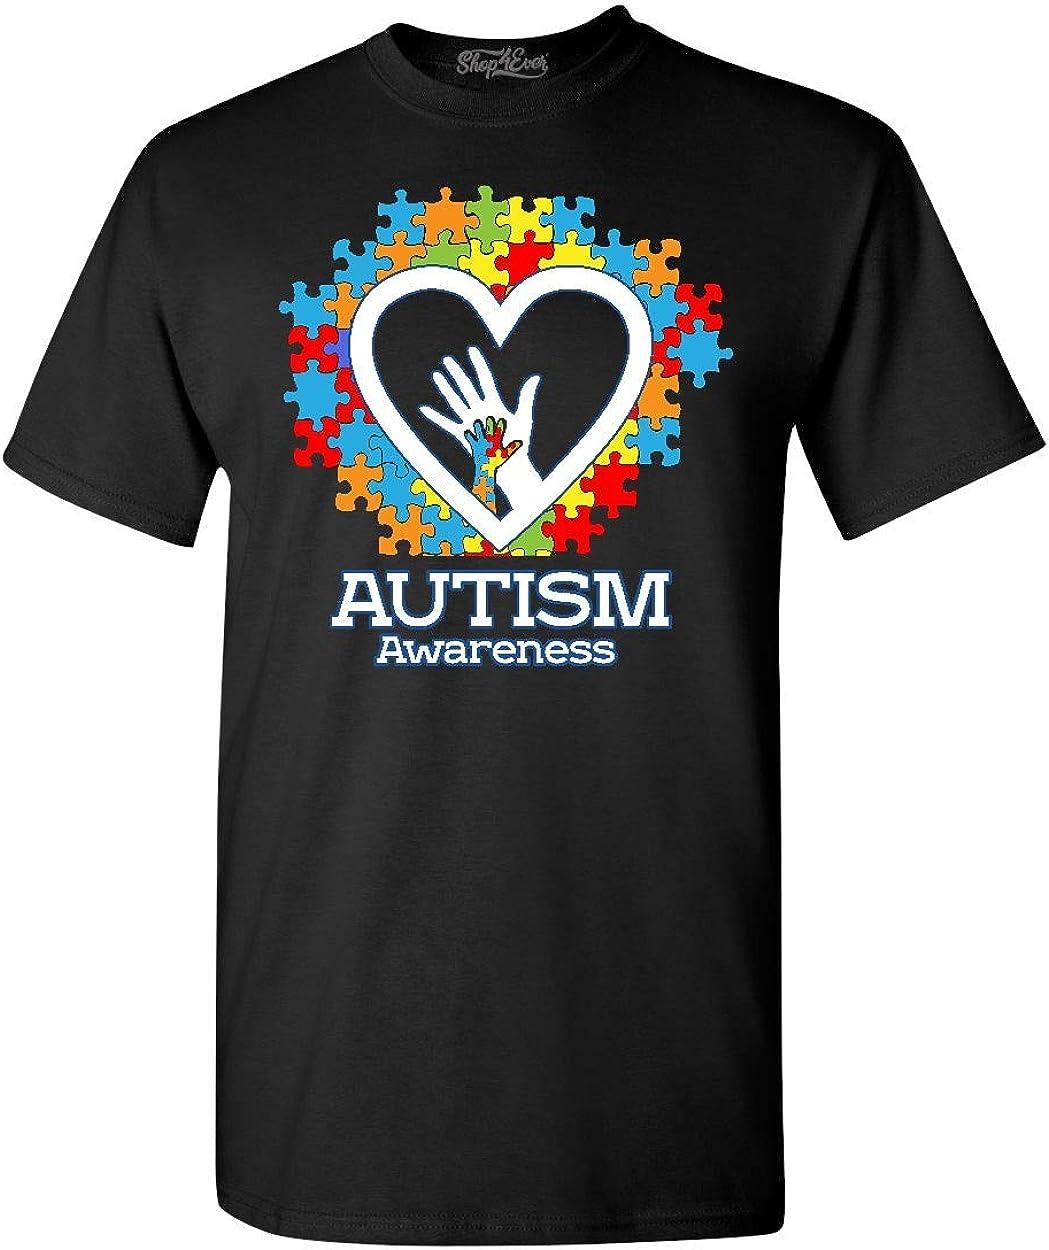 specialty shop shop4ever Autism Awareness Popular brand Hands T-Shirt in Heart